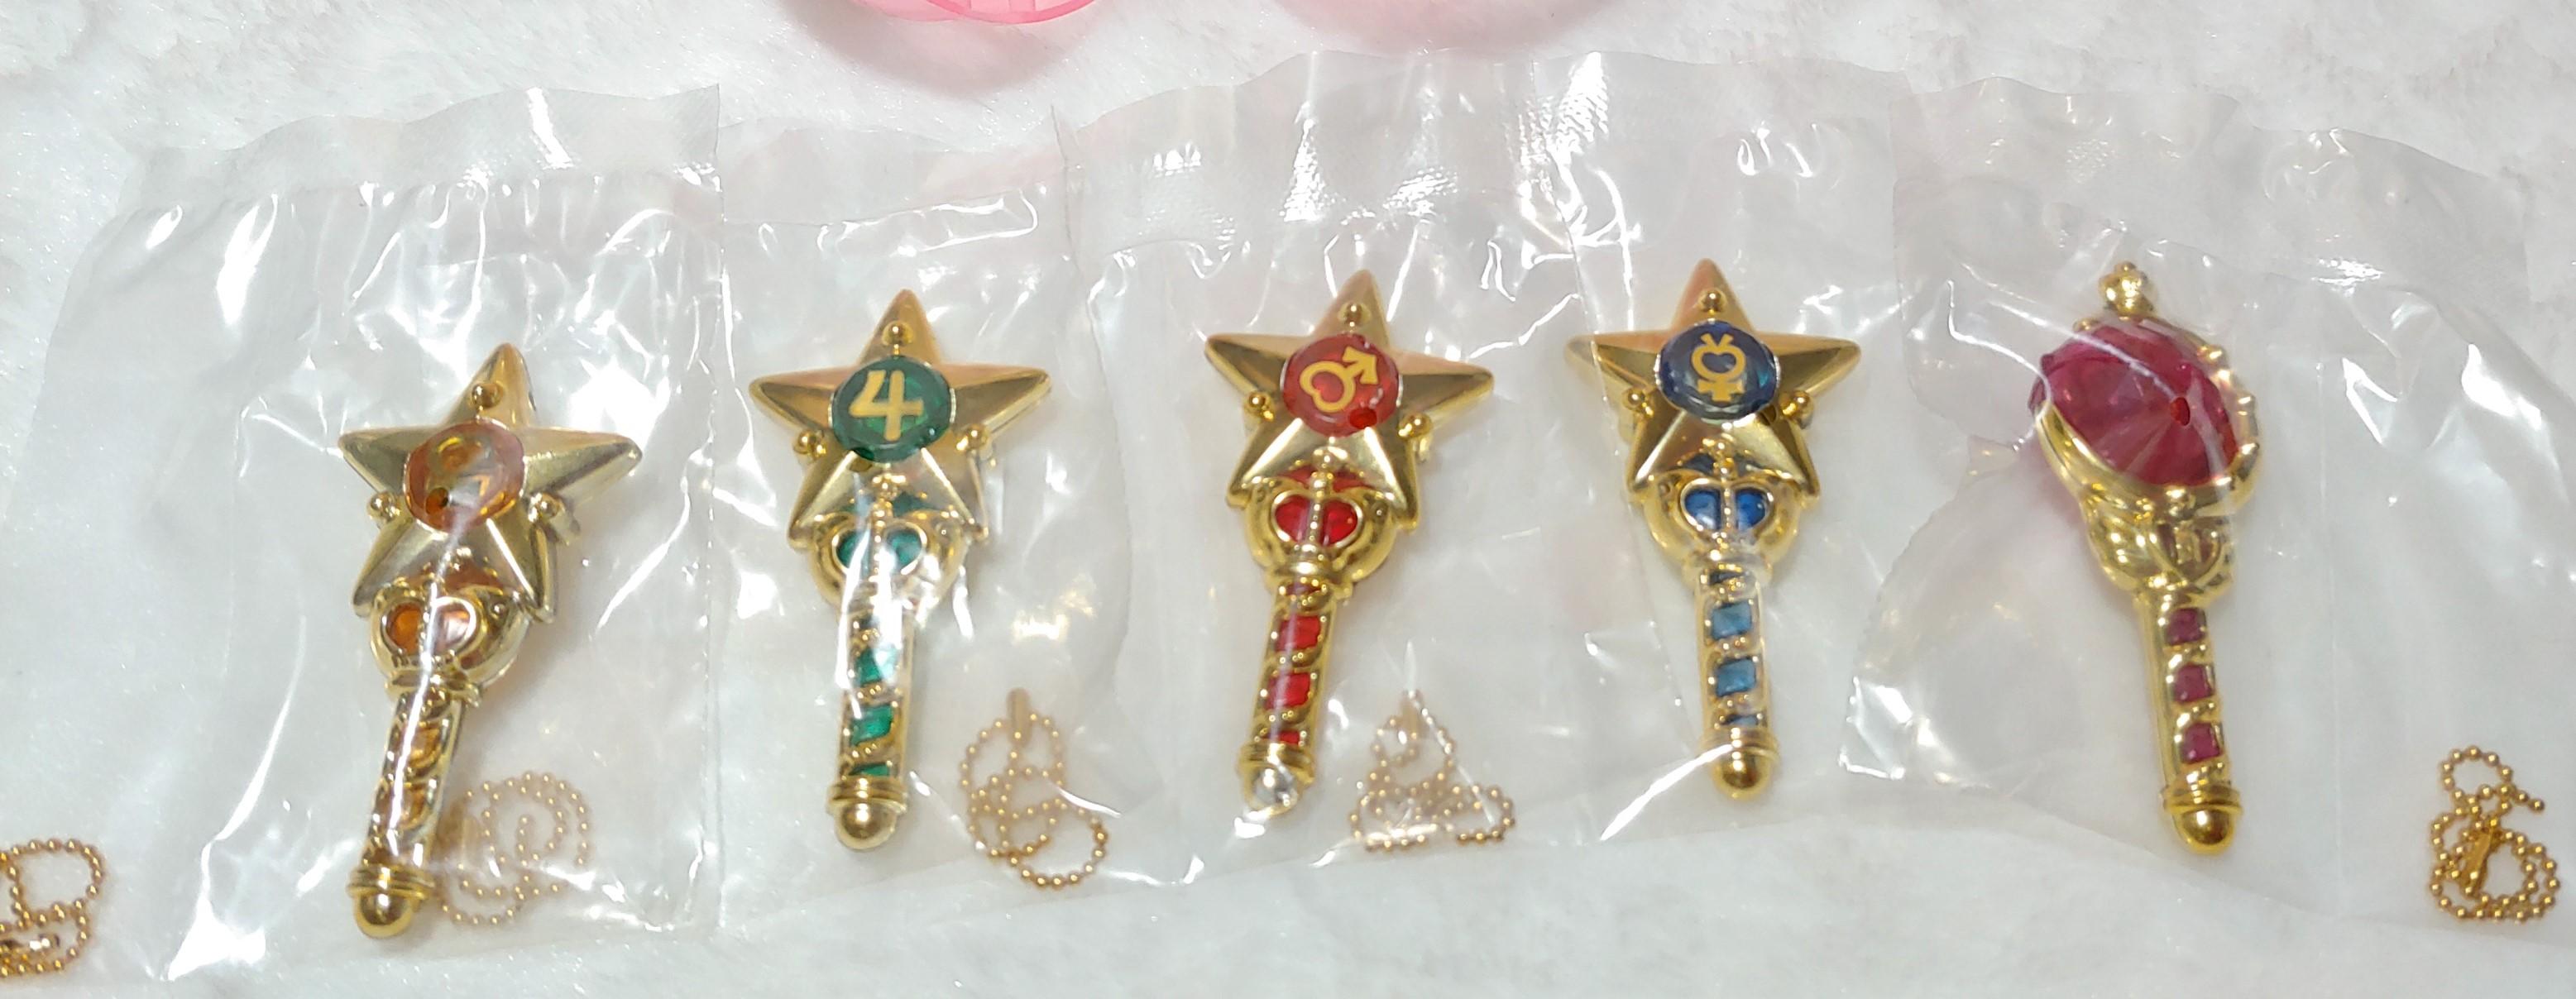 Sailormoon Crystal Stick and Rod Gashapon Keychain by Bandai